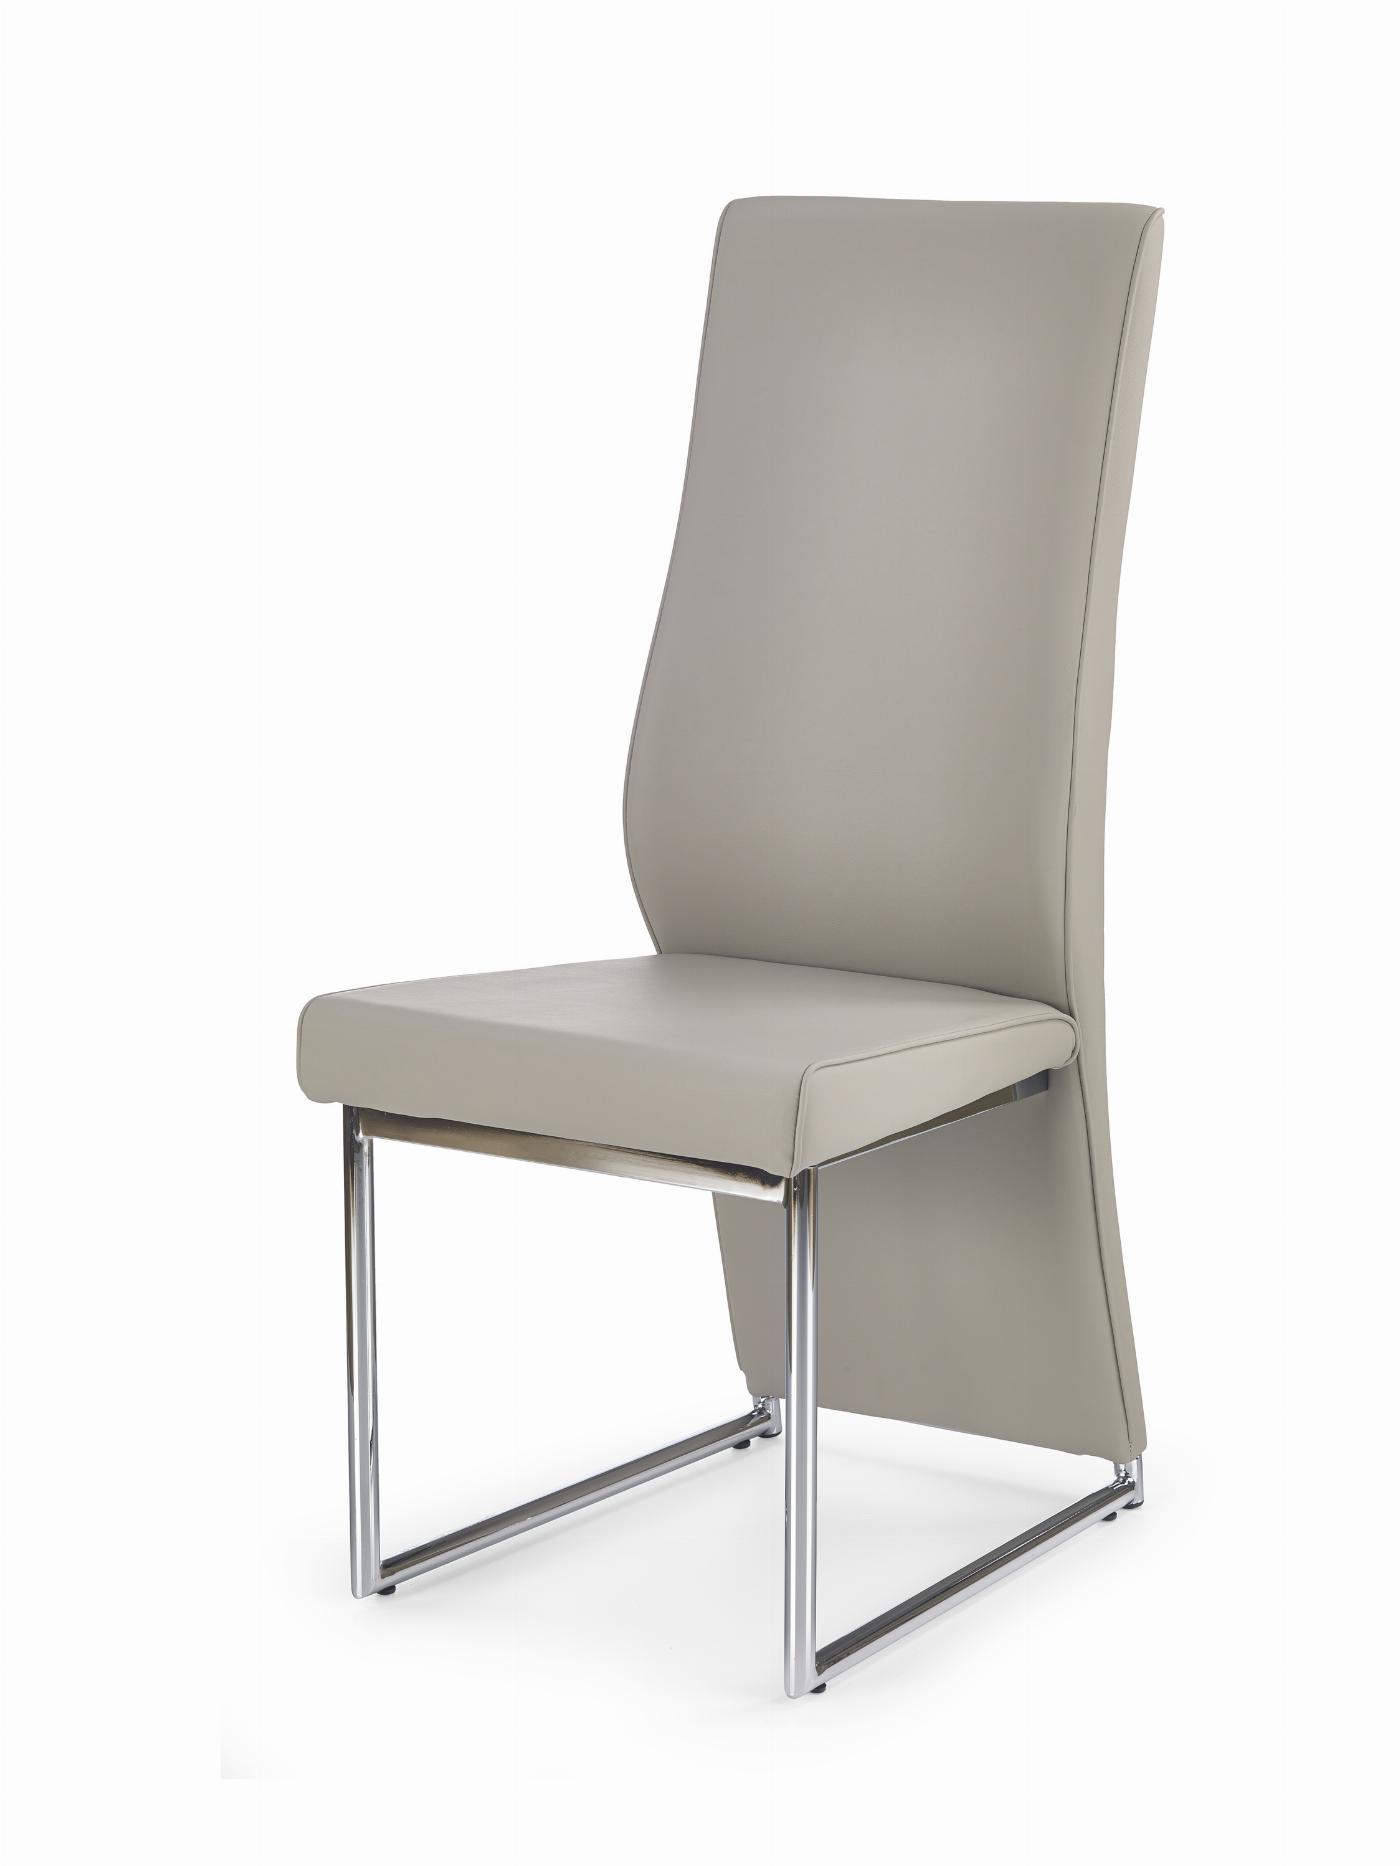 K213 krzesło cappuccino (1p=2szt)